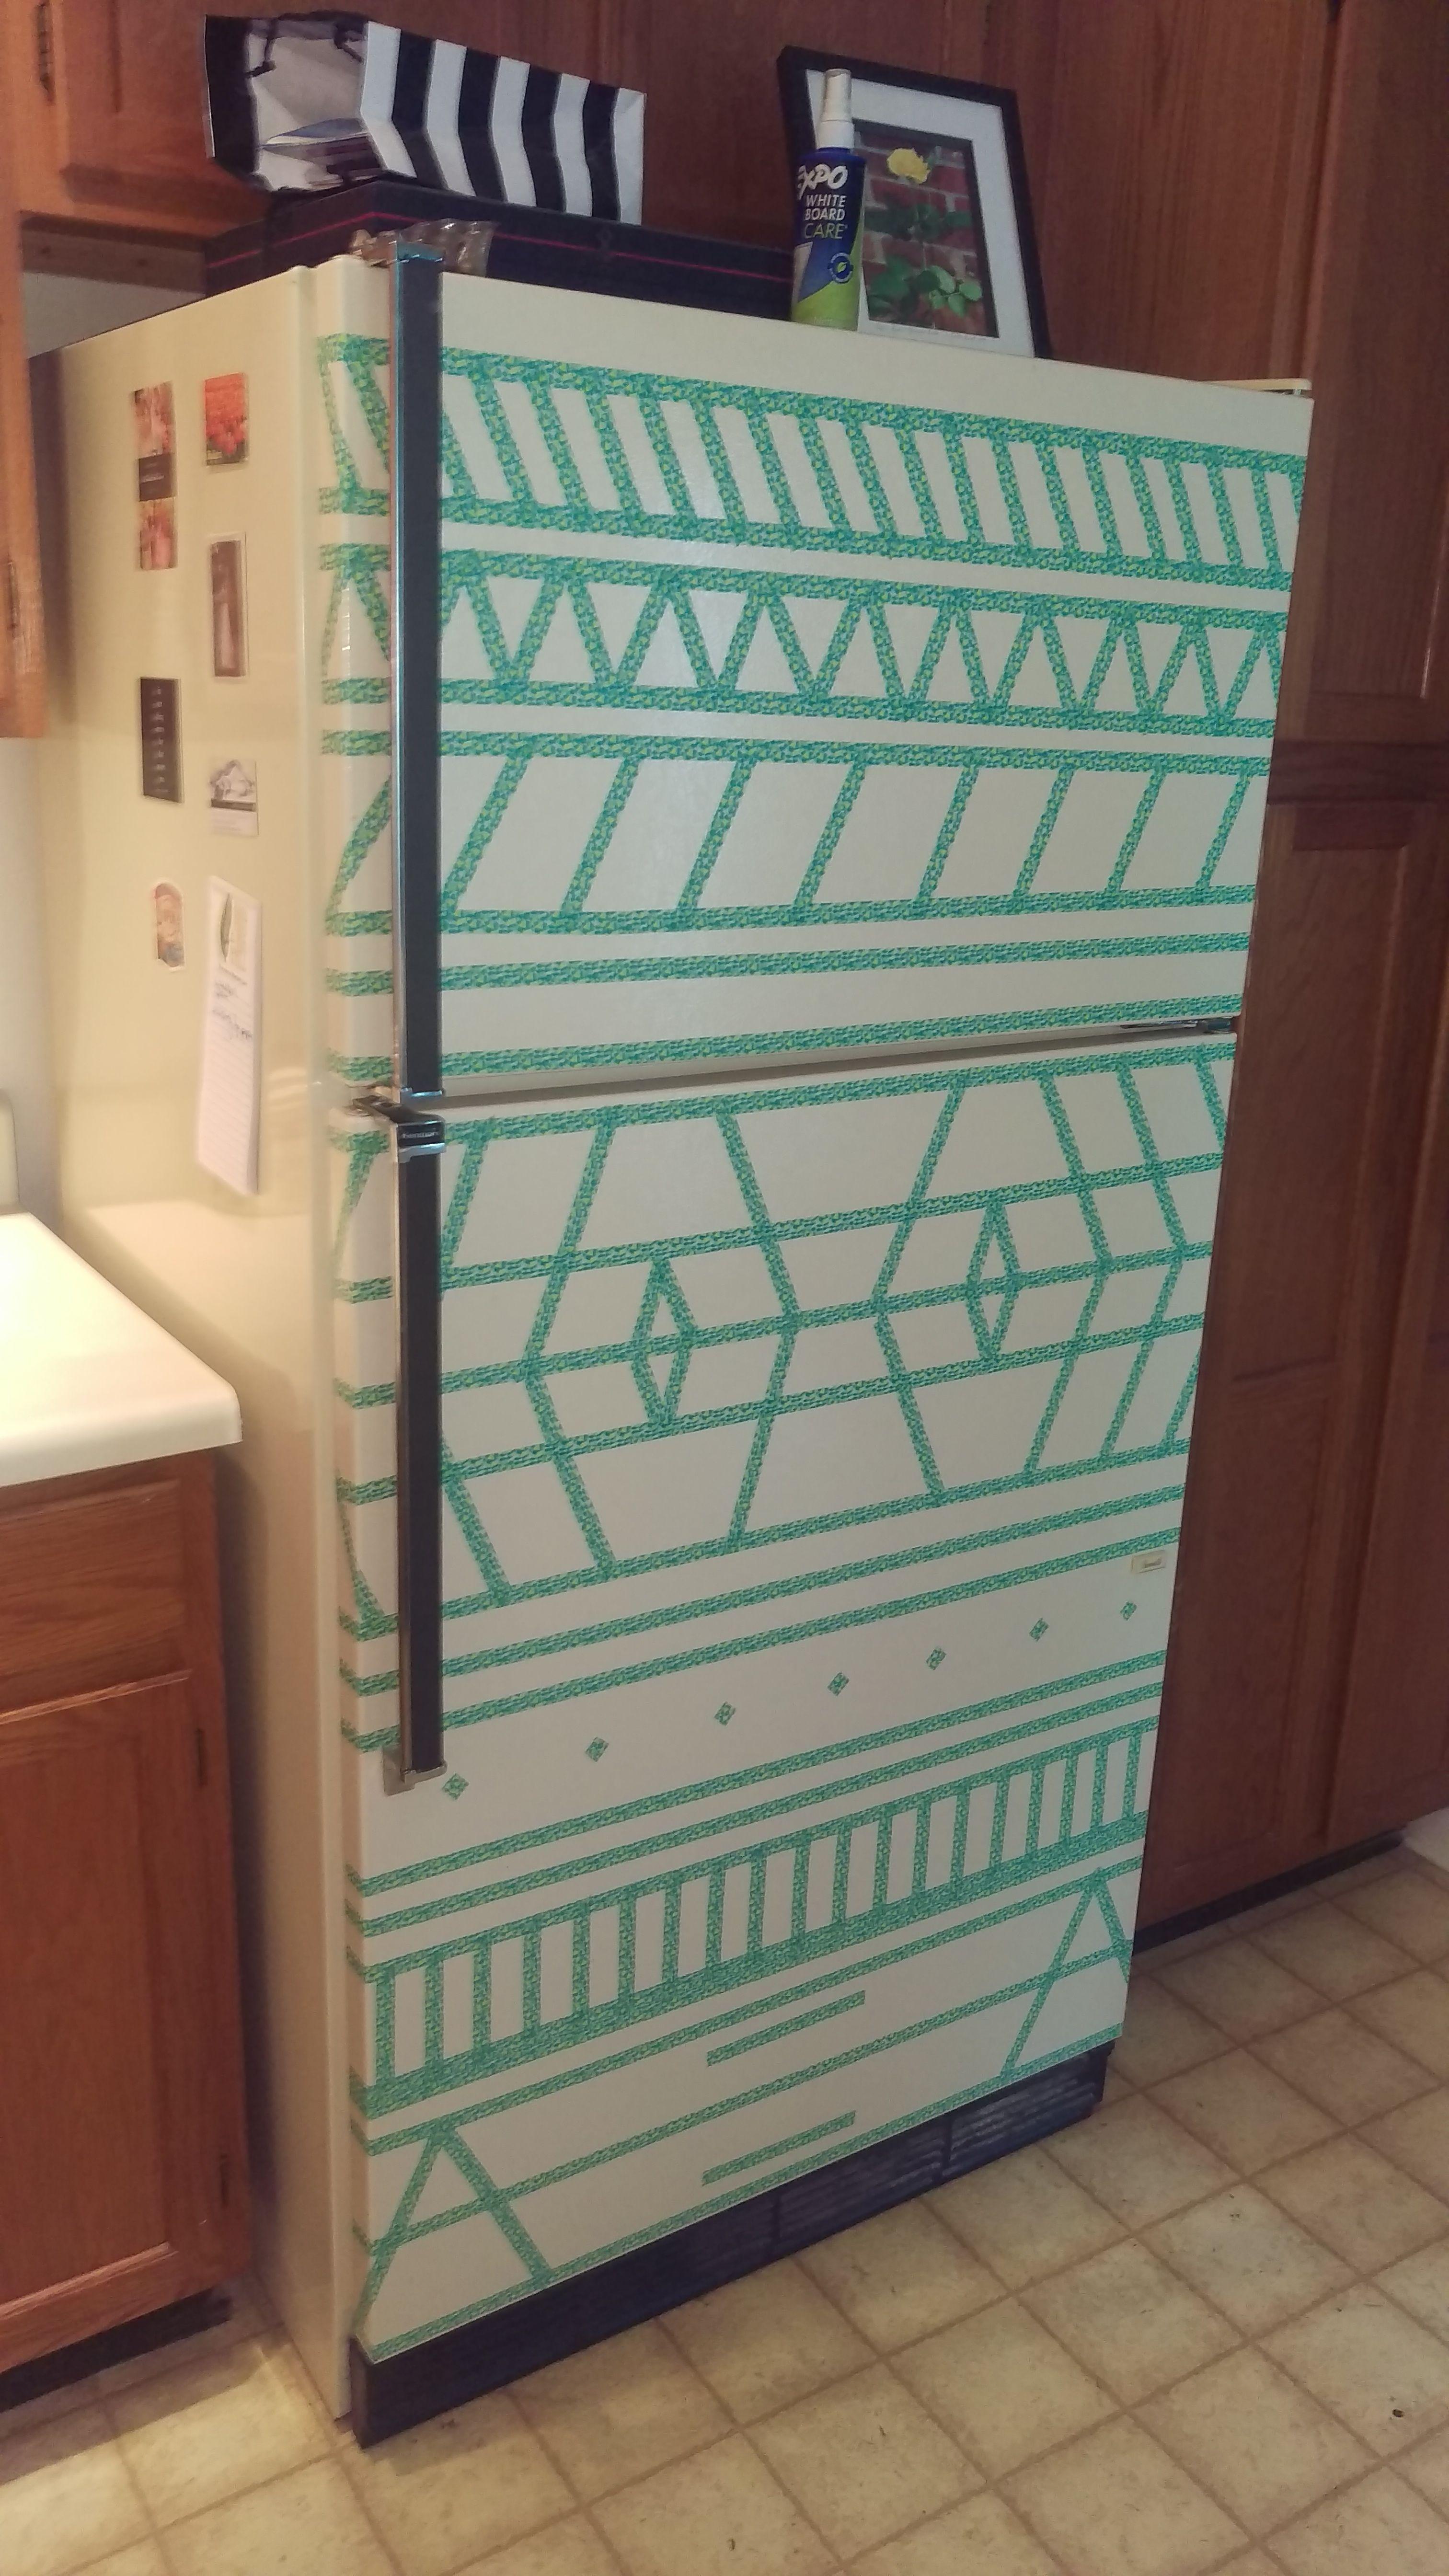 Washi Tape Kitchen Cabinets Diy Kitchen Cabinets With Washi Tape Daccor We Philippines And